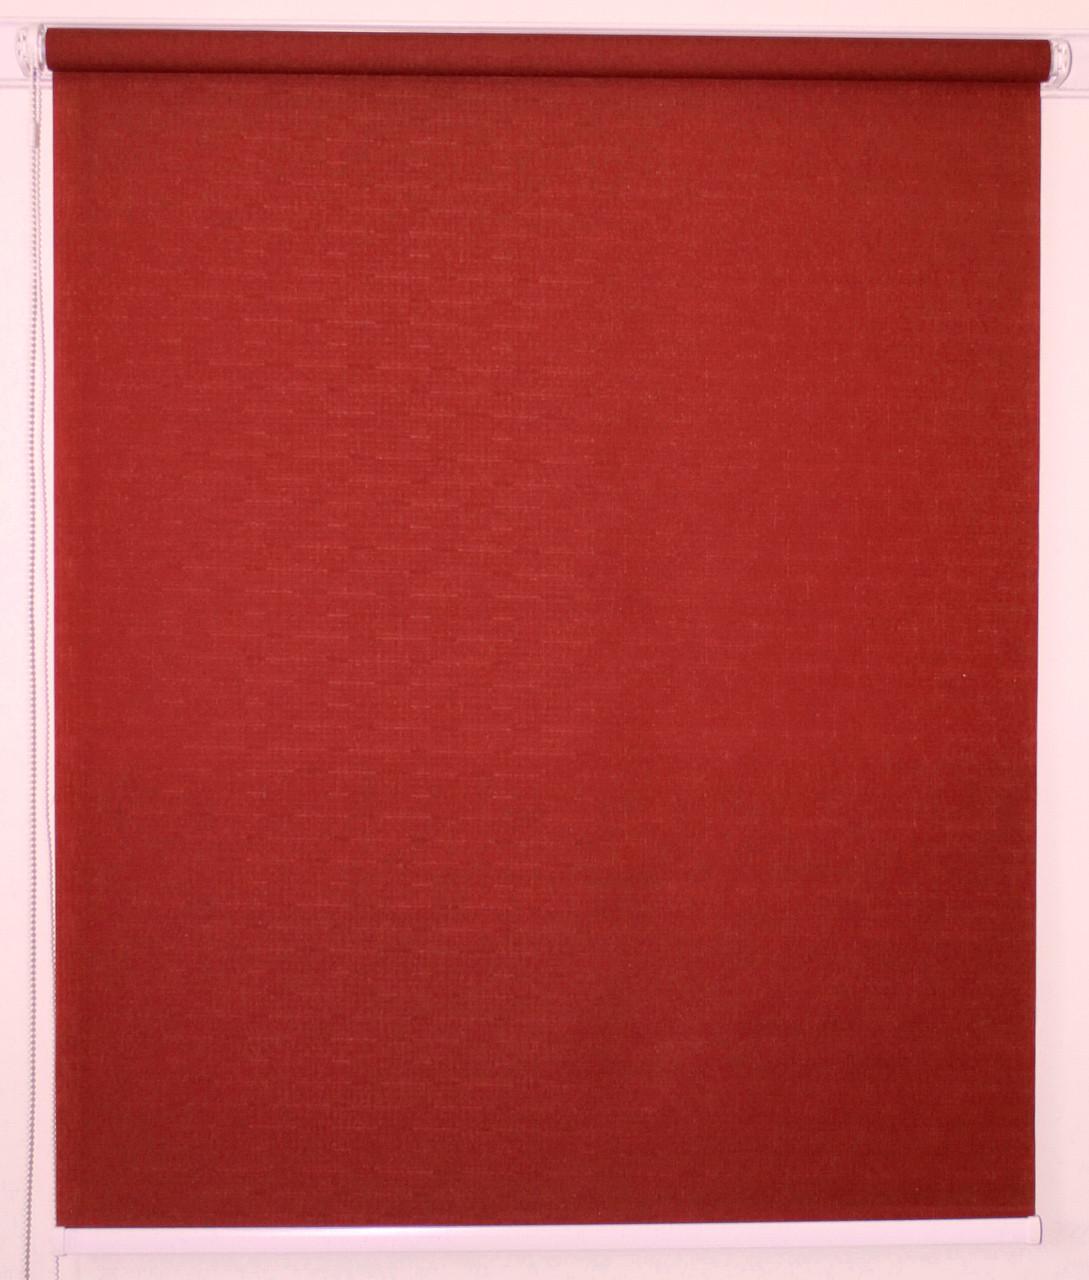 Рулонная штора 300*1500 Ткань Лён 888 Вишнёвый